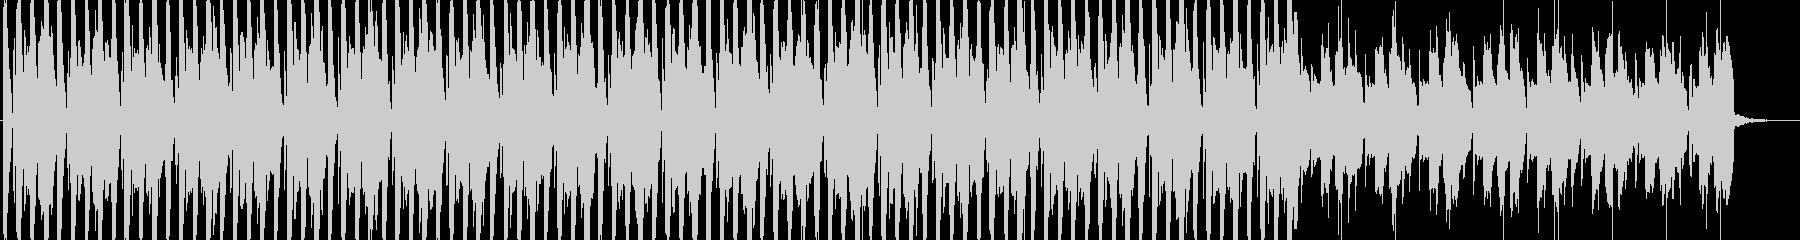 CM等のBGMに適した軽快なサウンドの未再生の波形